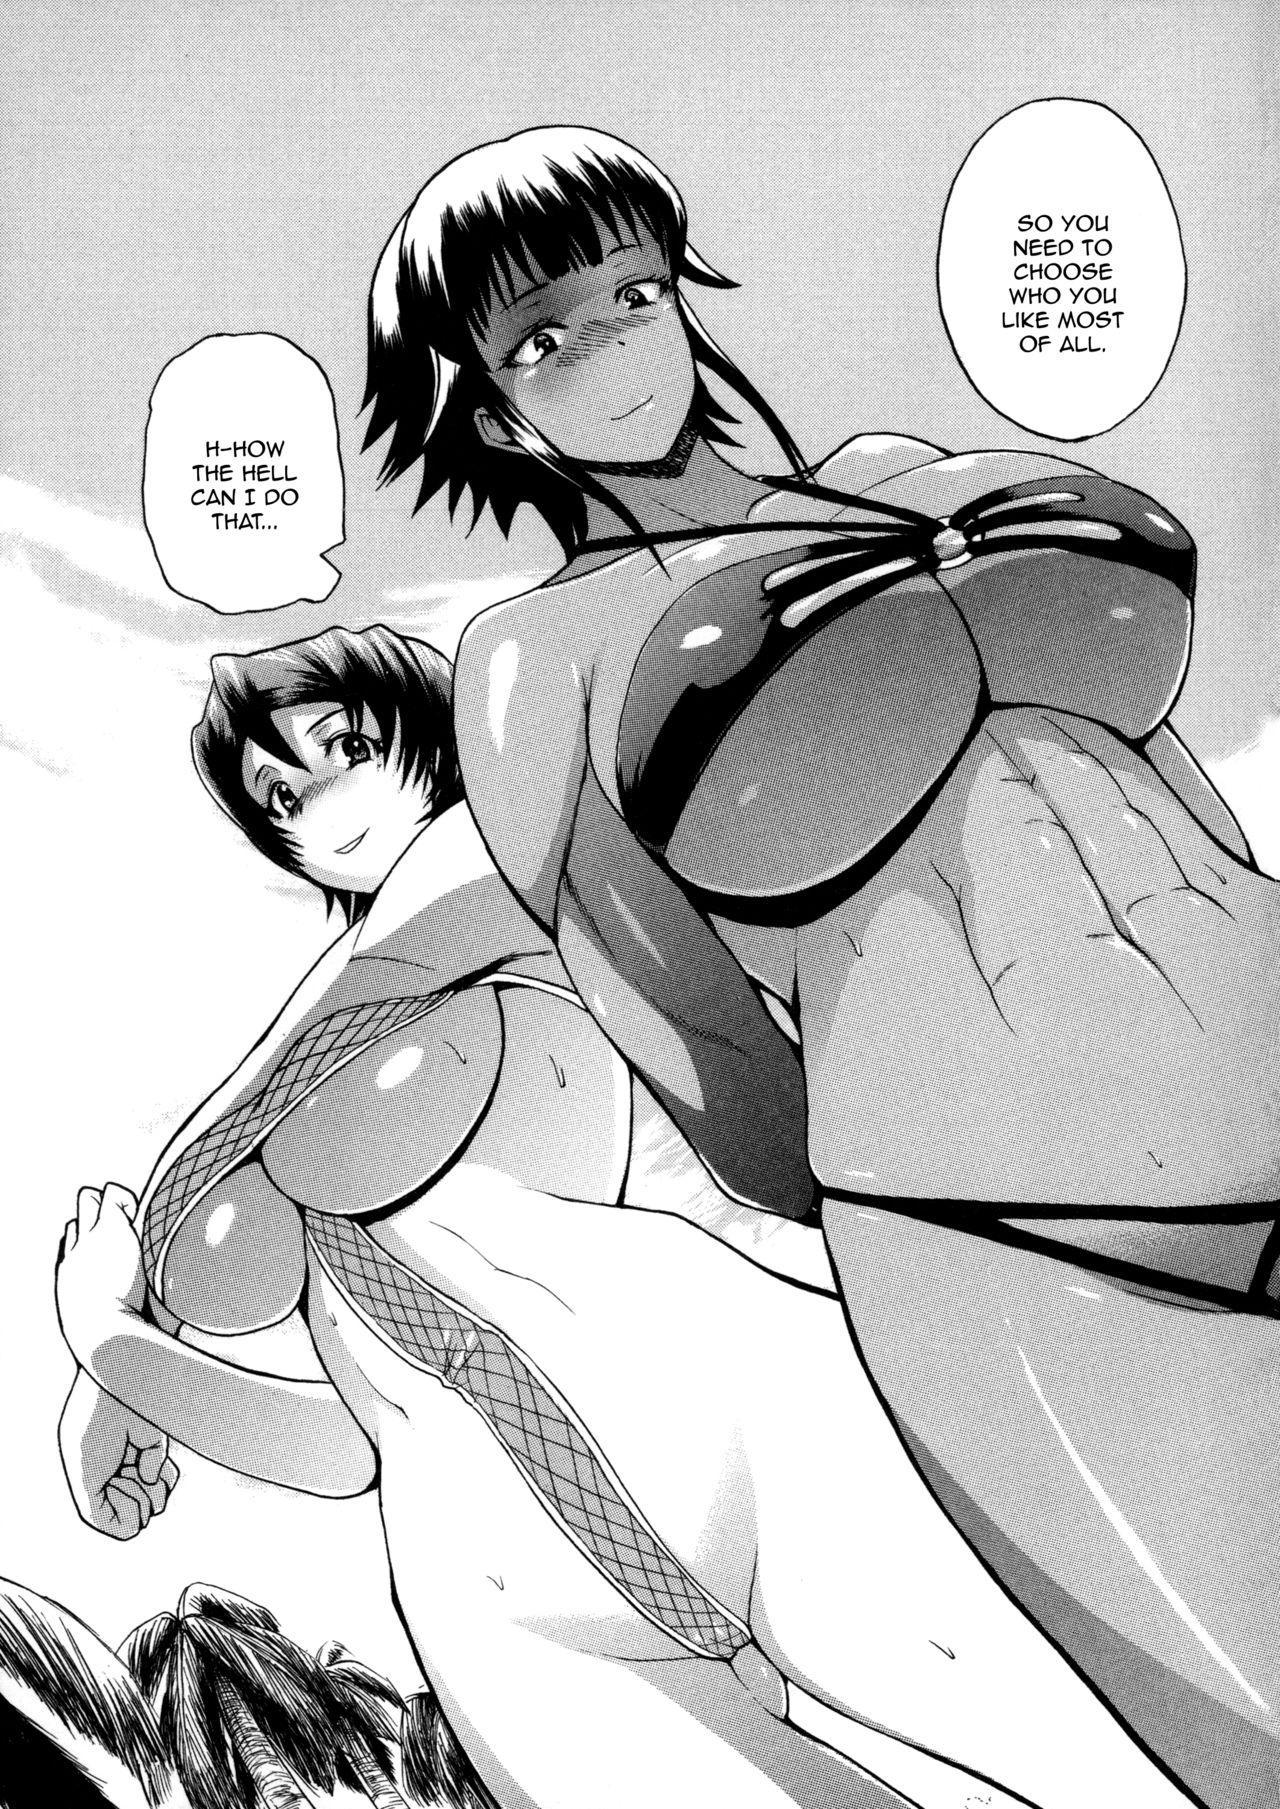 [Yoshimura Tatsumaki] Monzetsu Taigatame ~Count 3 de Ikasete Ageru~ | Faint in Agony Bodylock ~I'll make you cum on the count of 3~ [English] [Brolen] 198